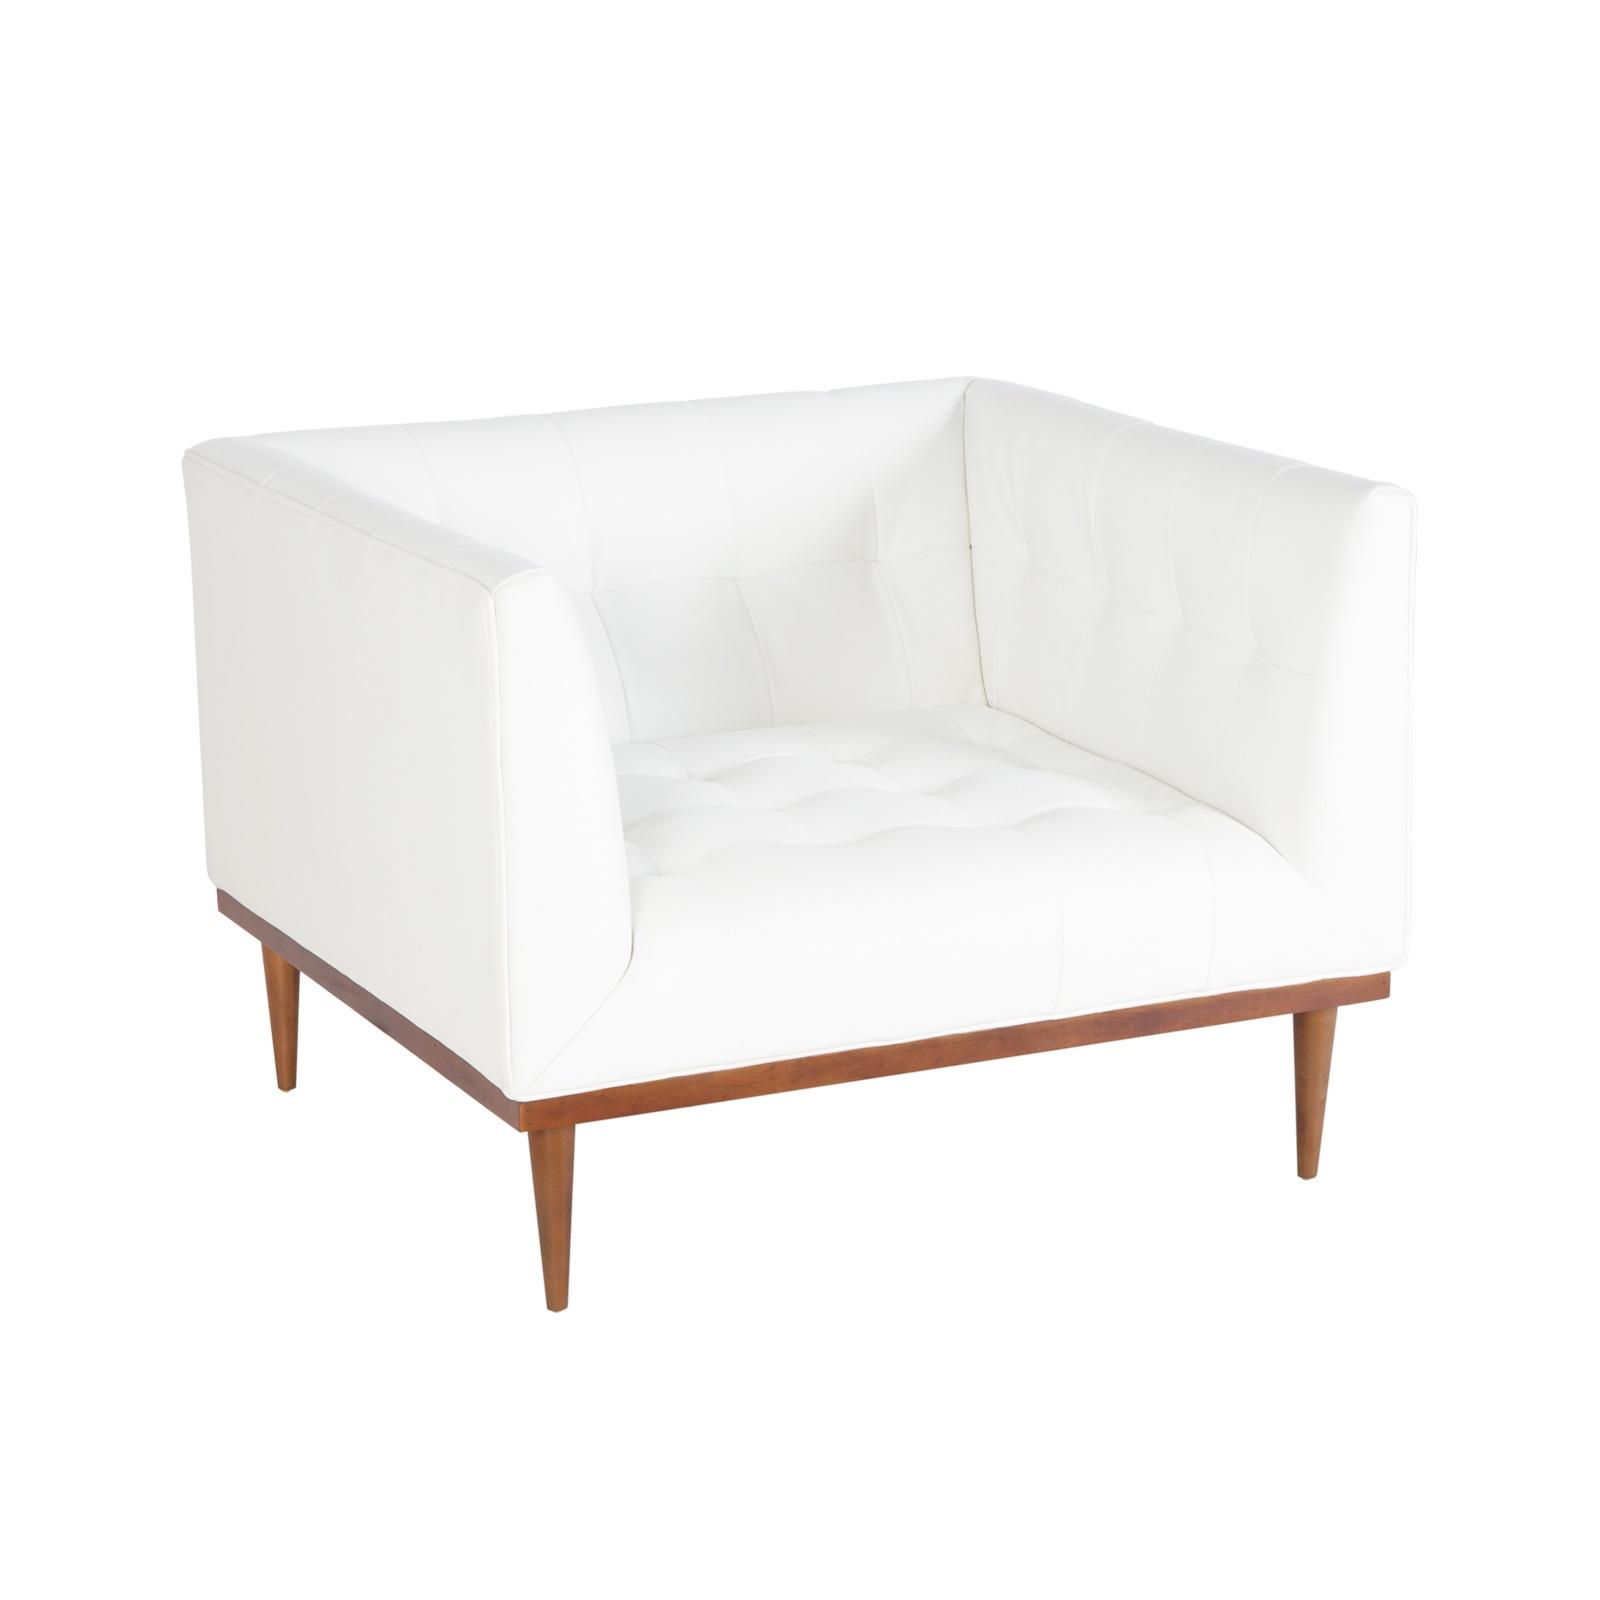 Enjoyable Edward Lounge Chair Walnut Event Trade Show Furniture Bralicious Painted Fabric Chair Ideas Braliciousco